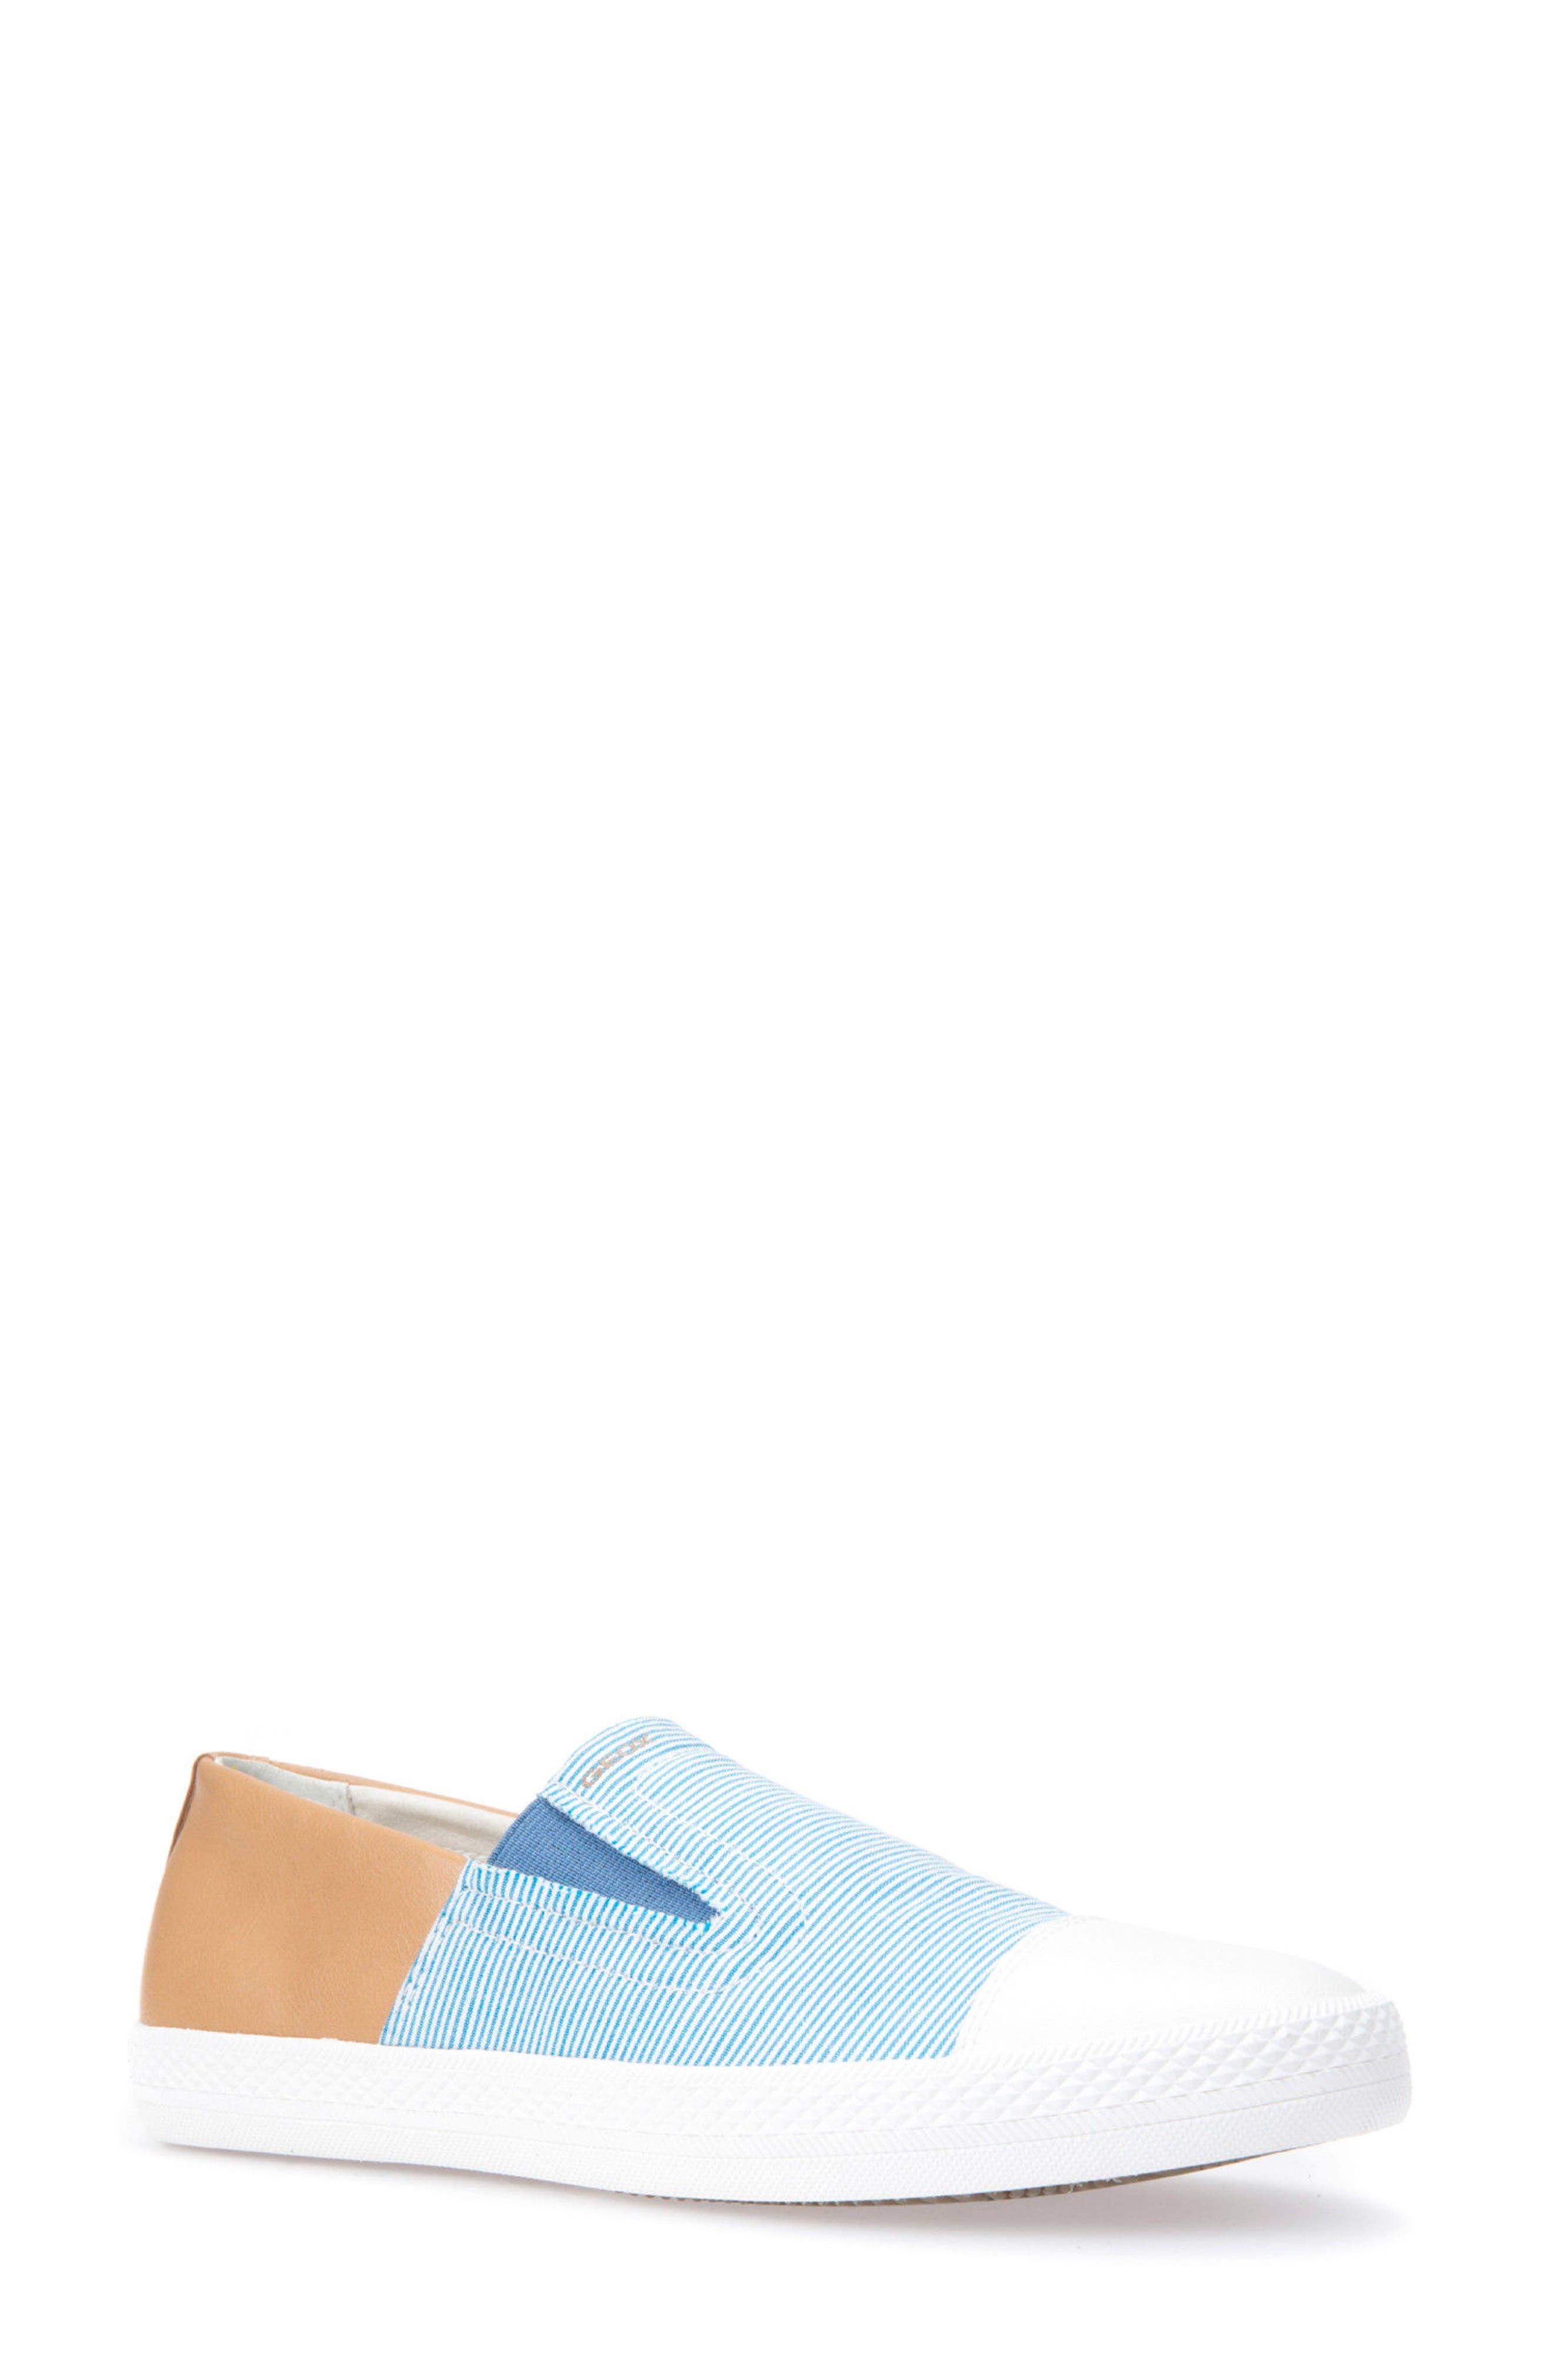 Giyo Slip-On Sneaker,                             Main thumbnail 1, color,                             462